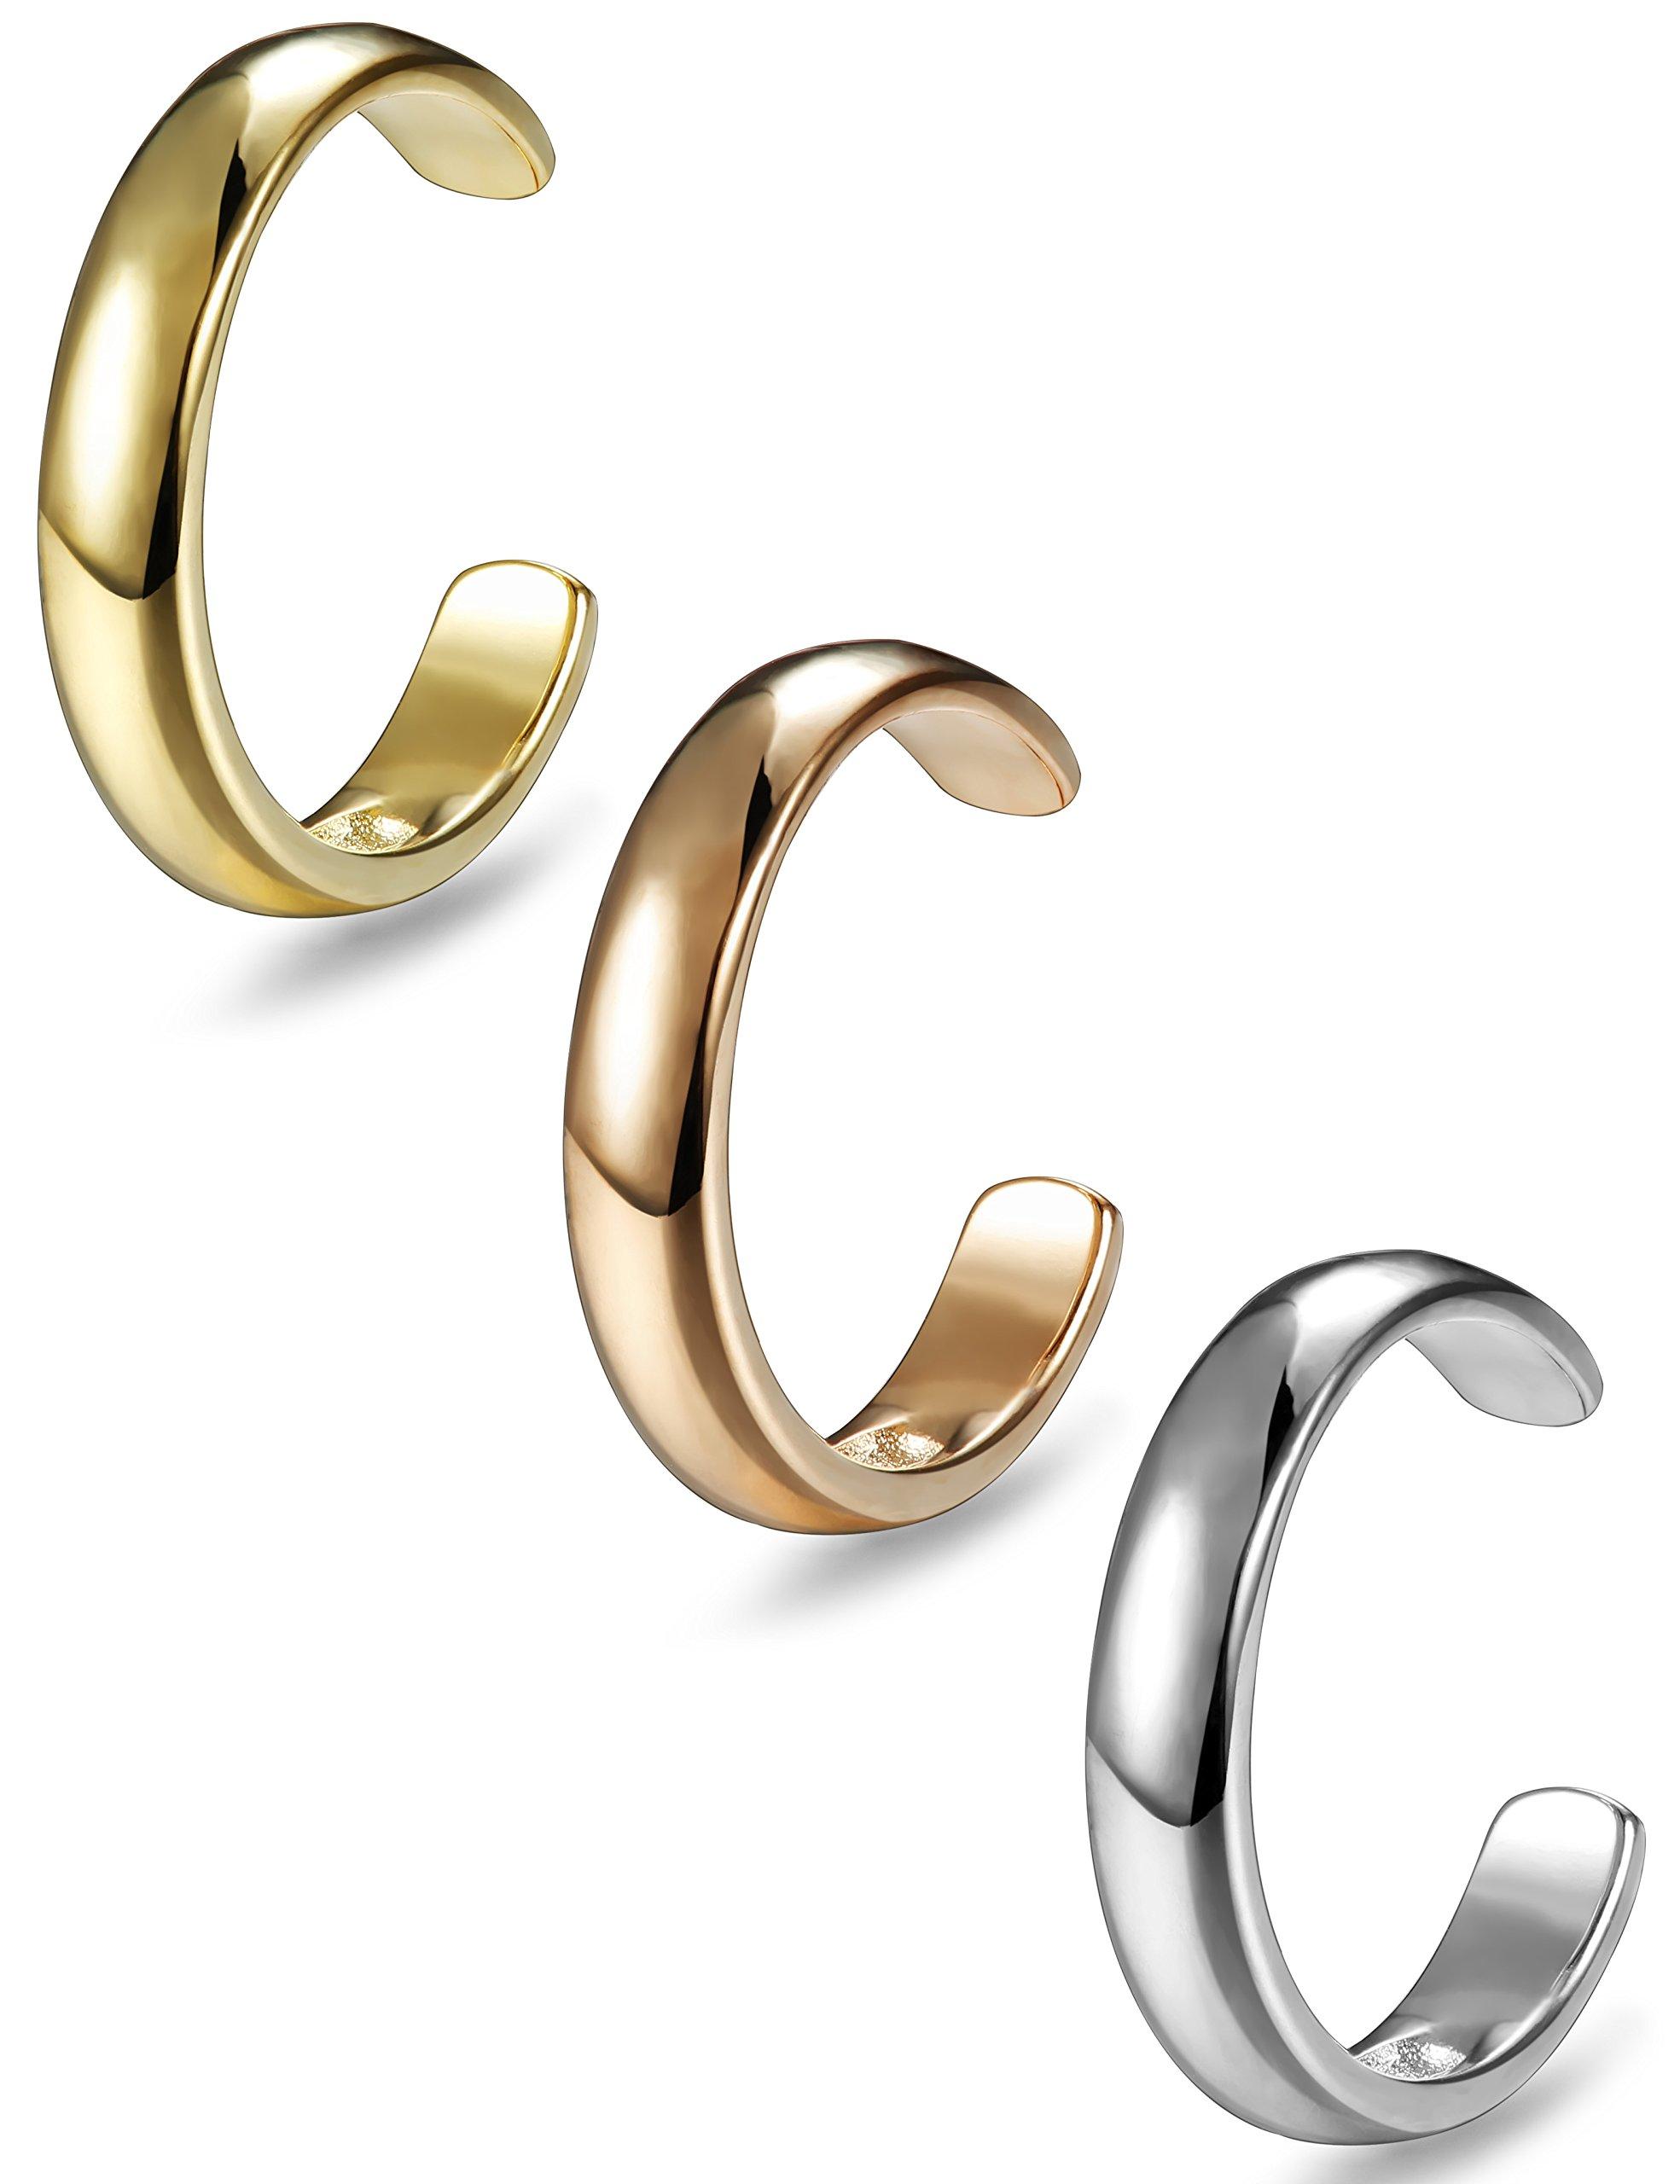 FIBO STEEL 3 Pcs Open Toe Ring for Women Adjustable Toe Ring Set,4MM (B: 3 Pcs a Set)